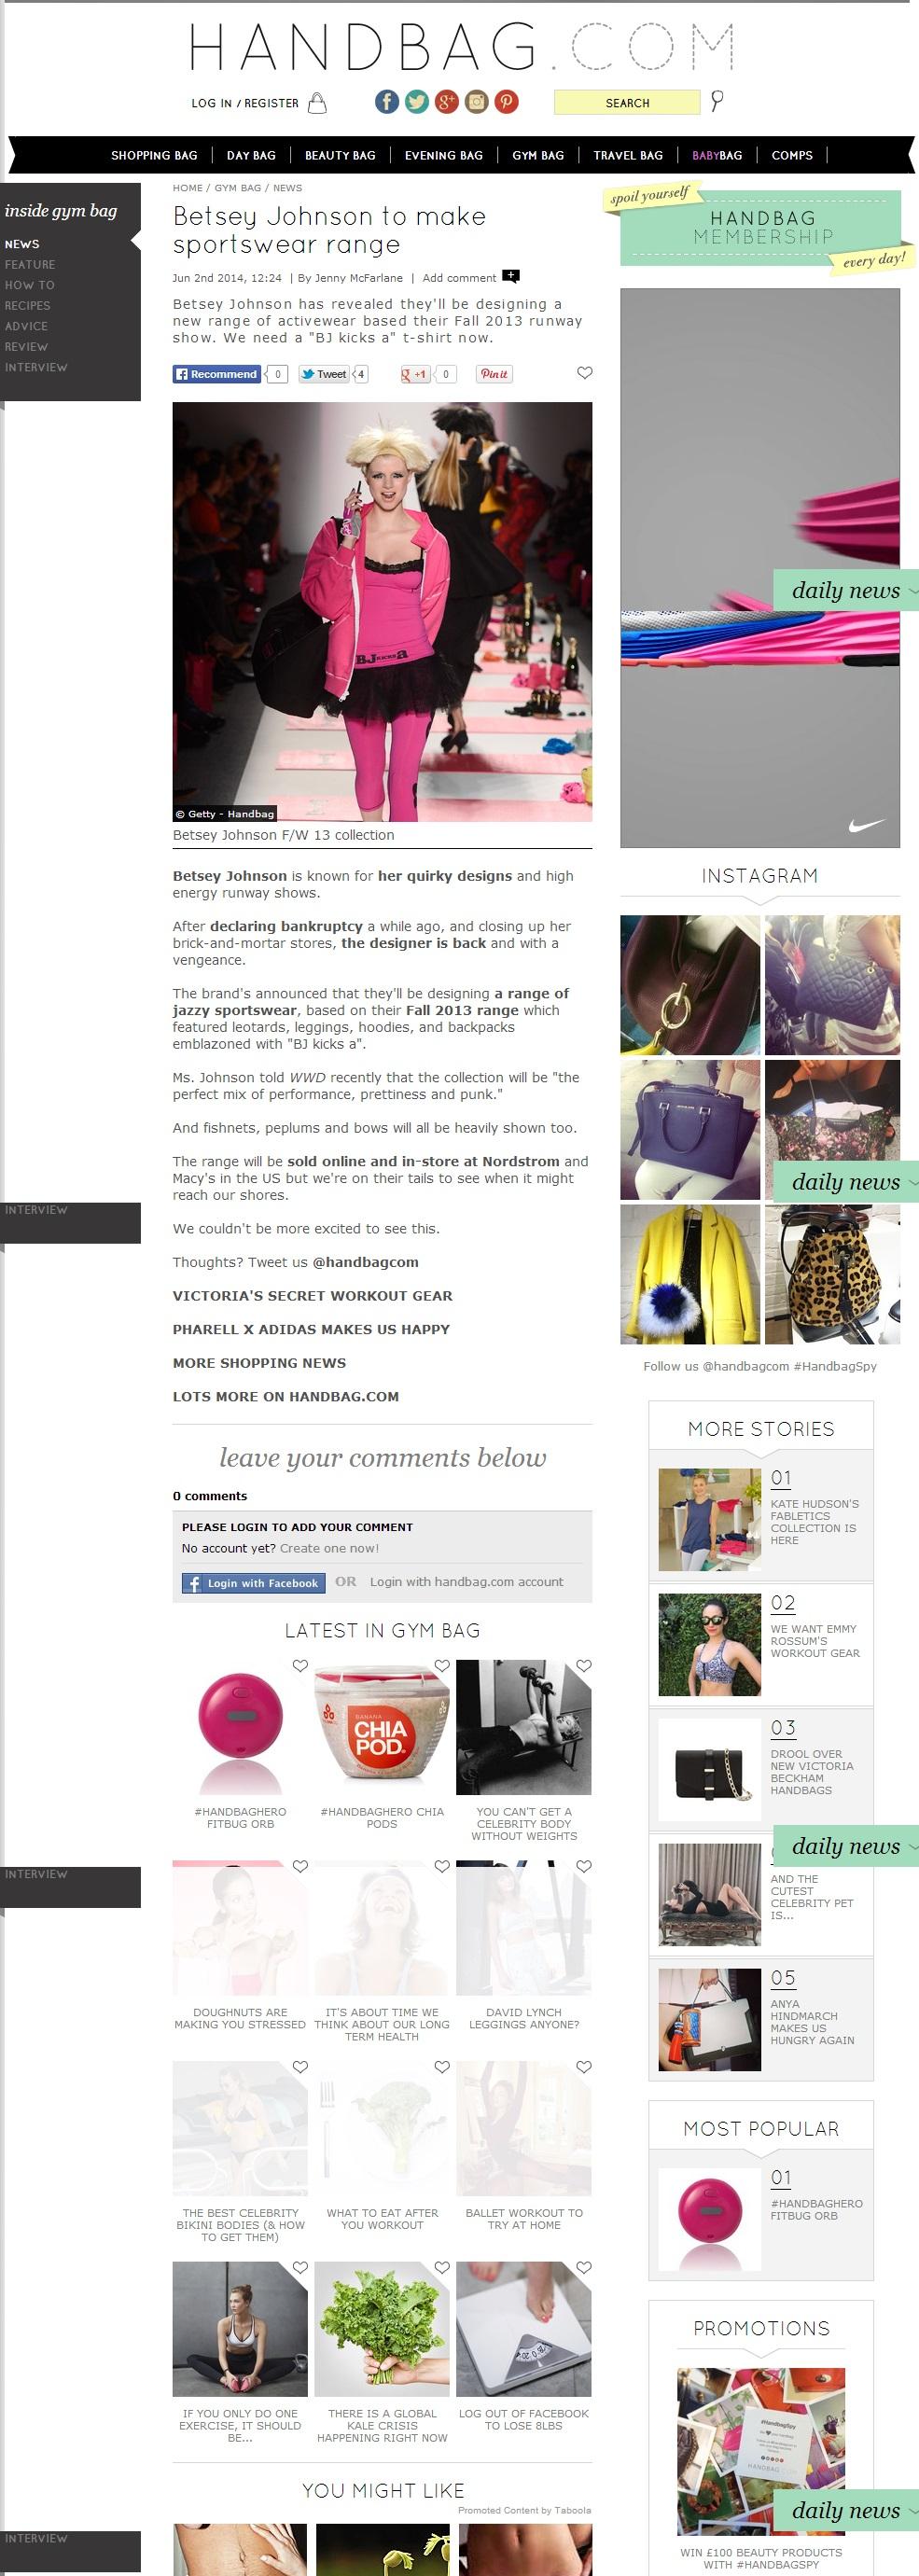 screencapture-www-handbag-com-gym-bag-news-a574871-betsey-johnson-to-make-sportswear-range-html